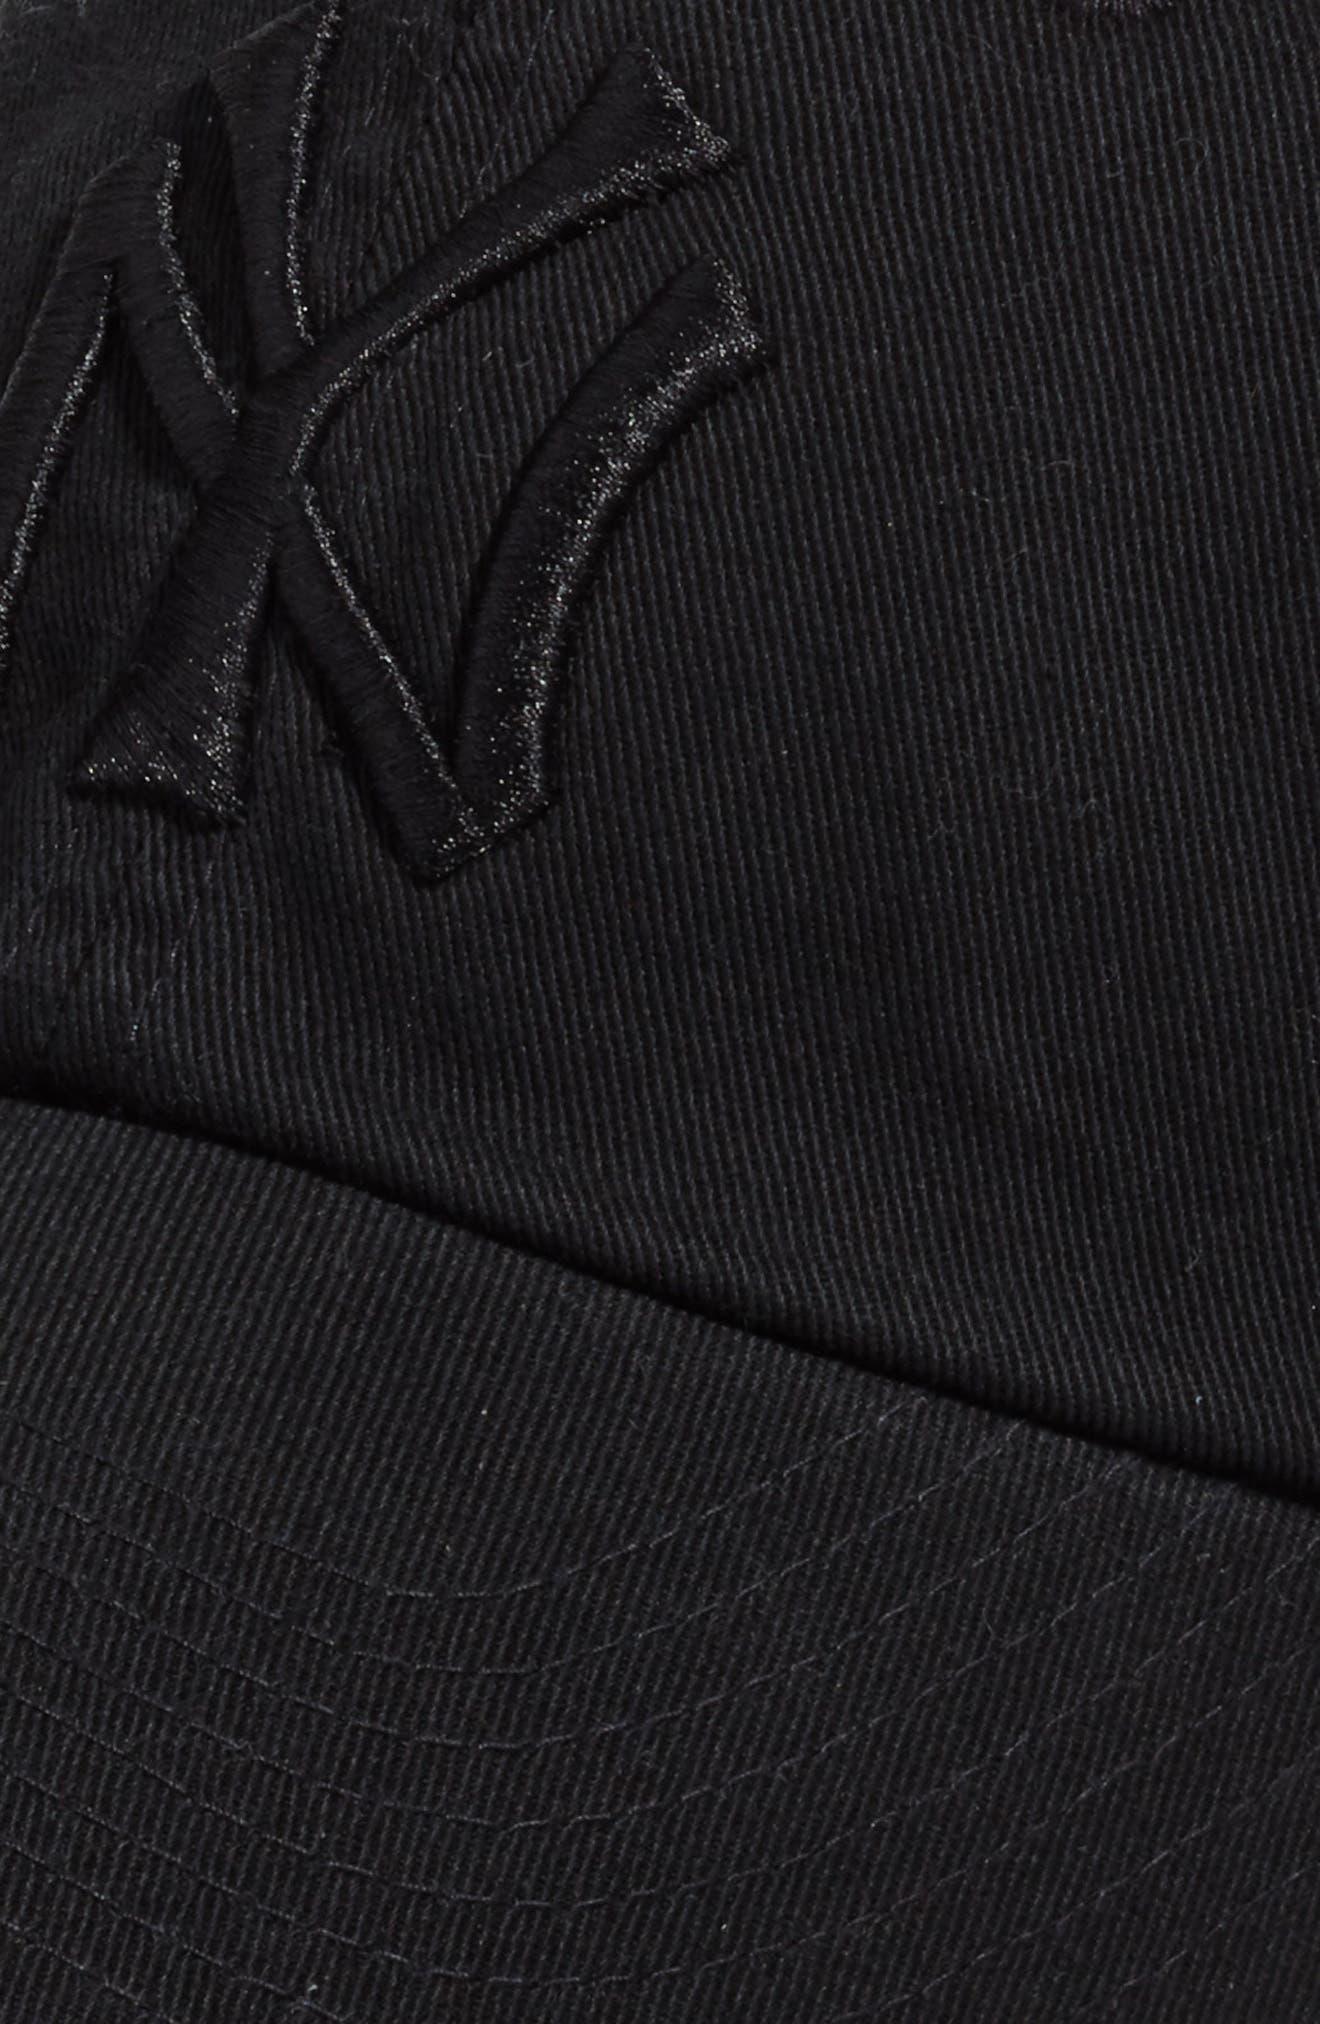 Ballpark - New York Yankees Baseball Cap,                             Alternate thumbnail 3, color,                             Black